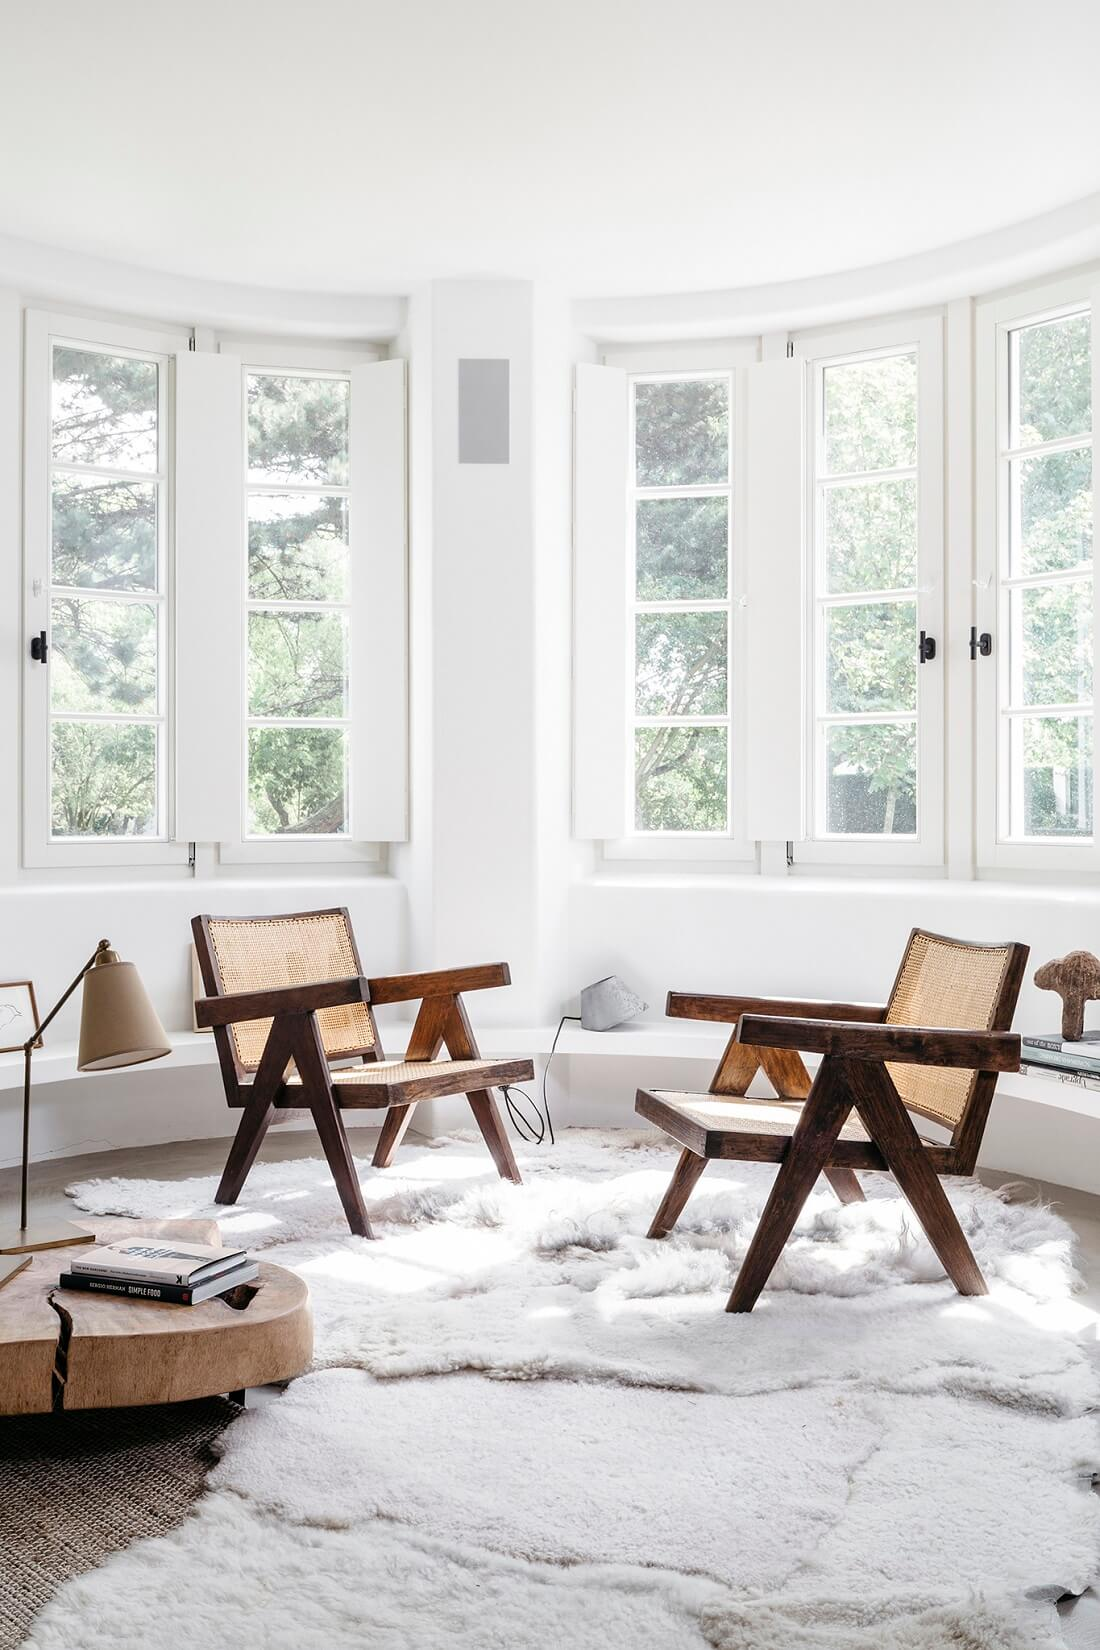 White & Wood in a Beautiful Summerhouse in Belgium